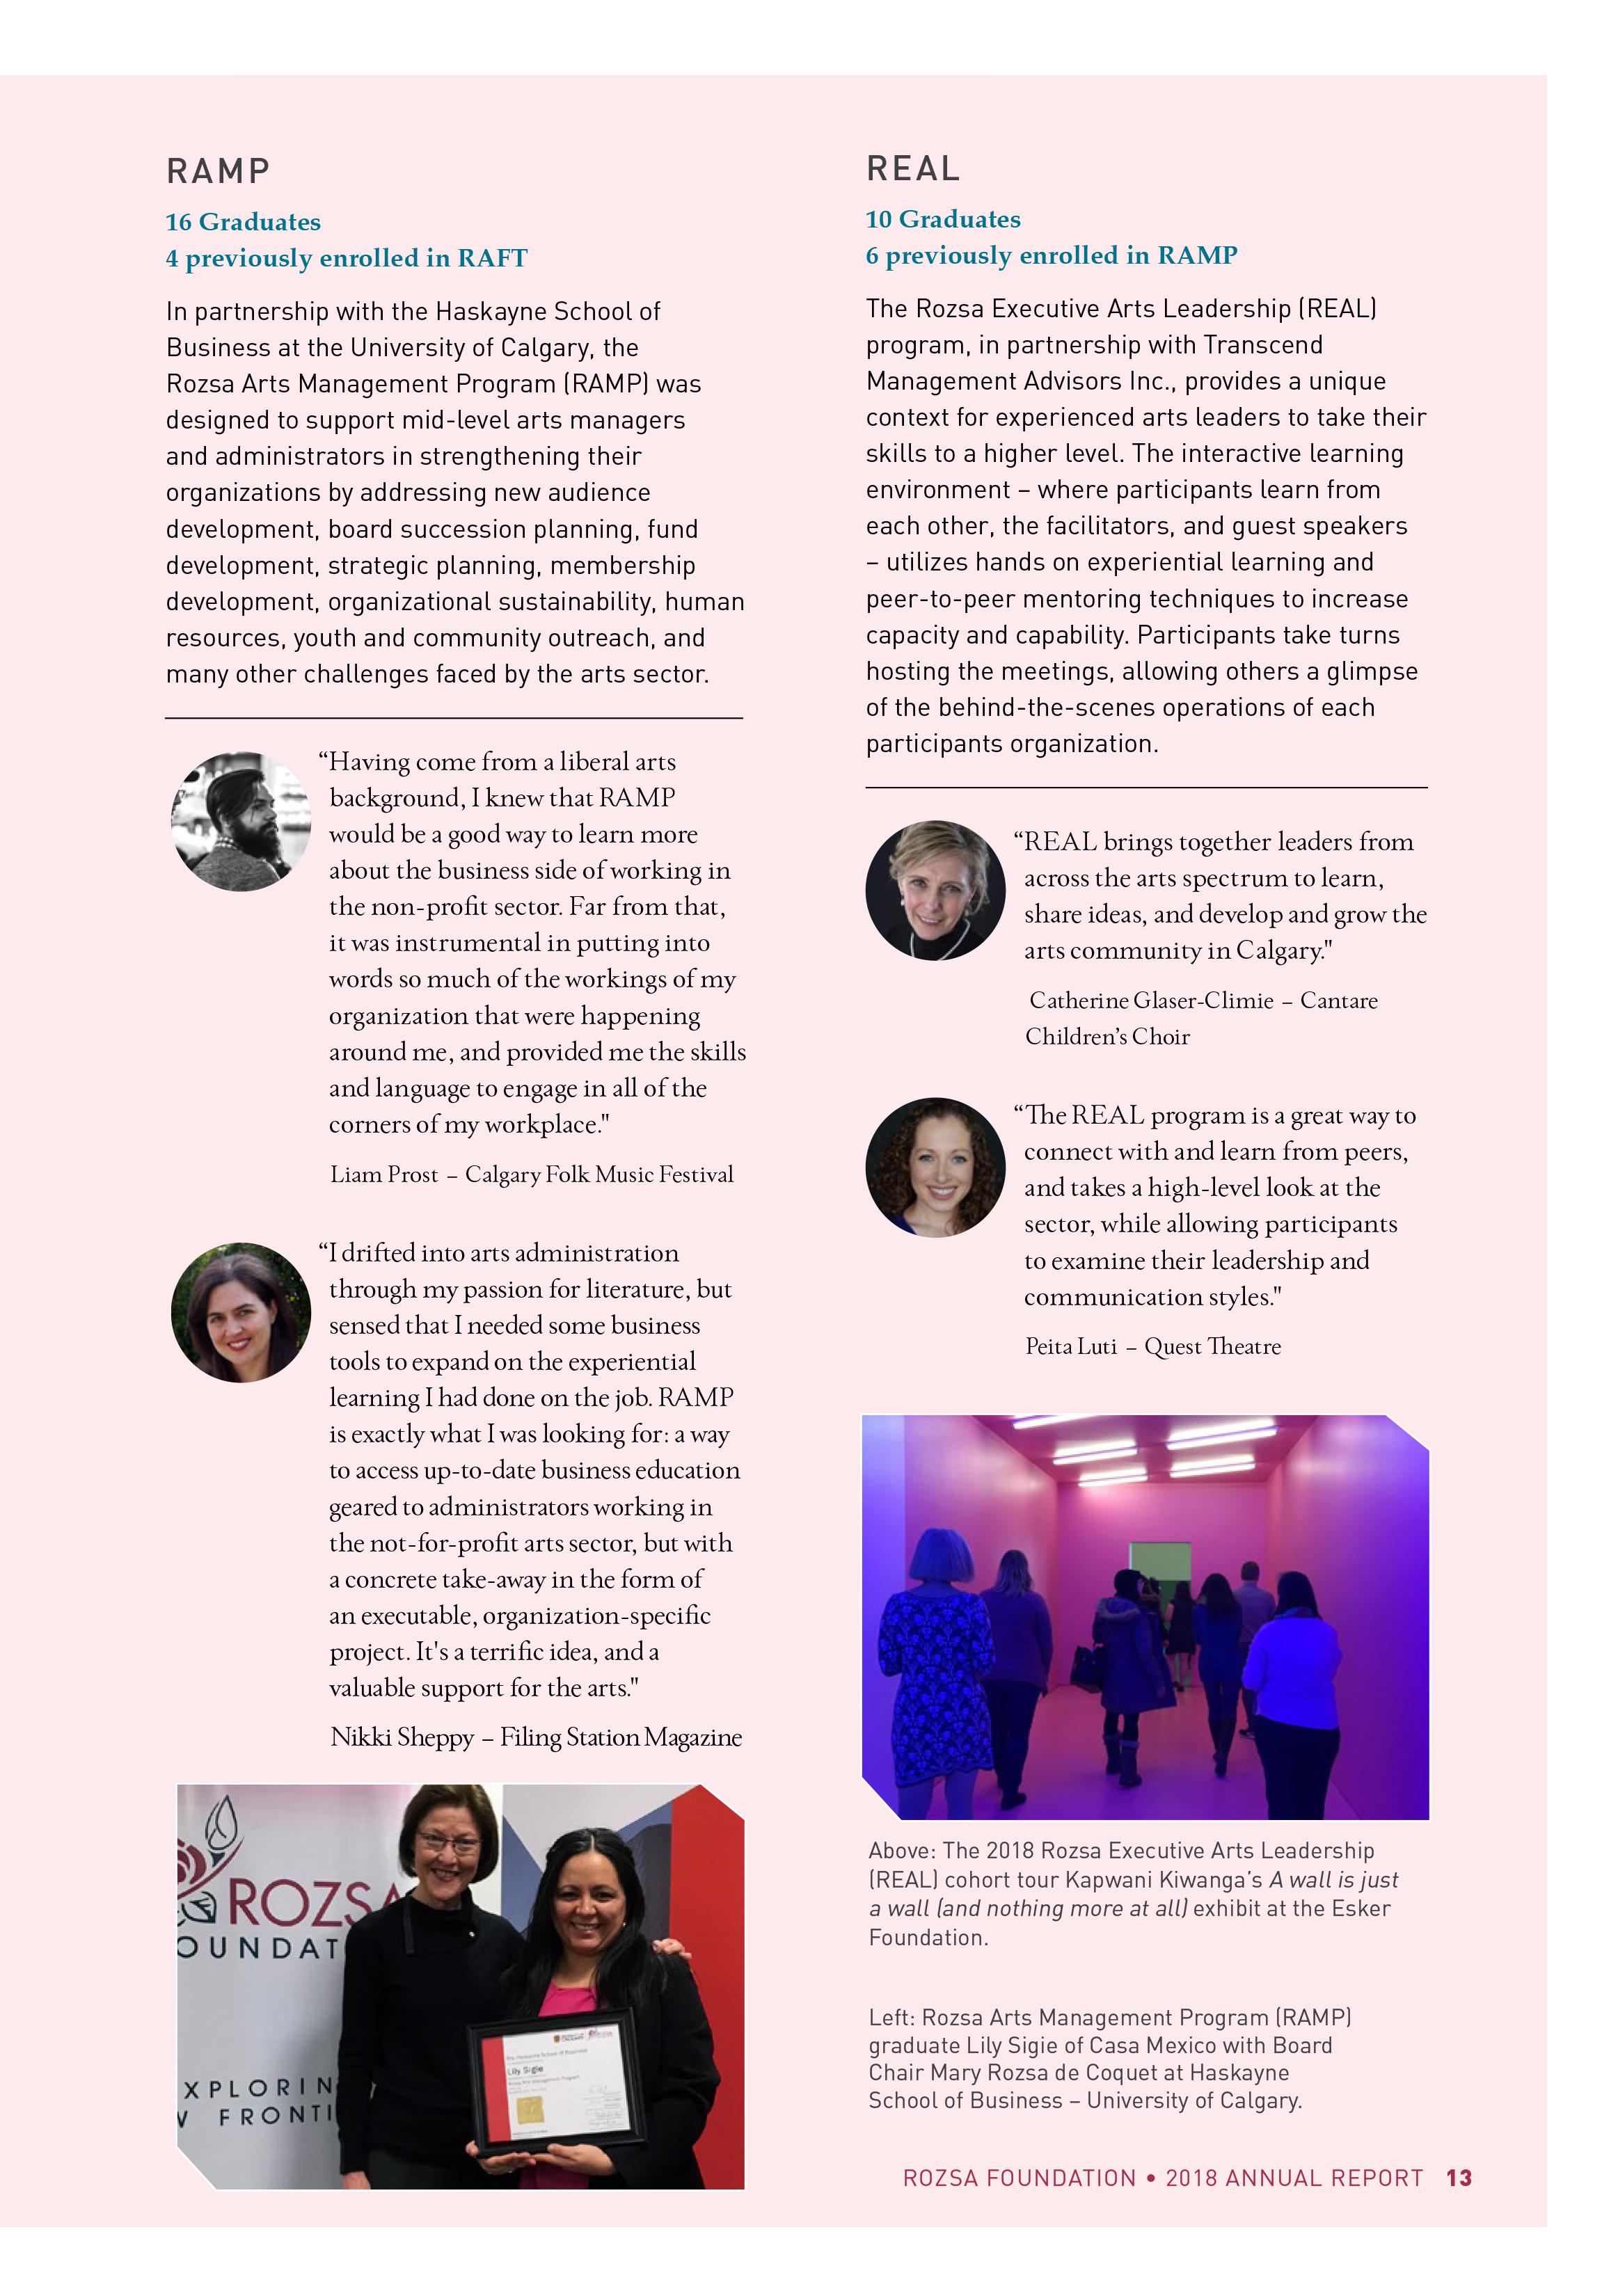 2018 Rozsa Foundation Annual Report-15